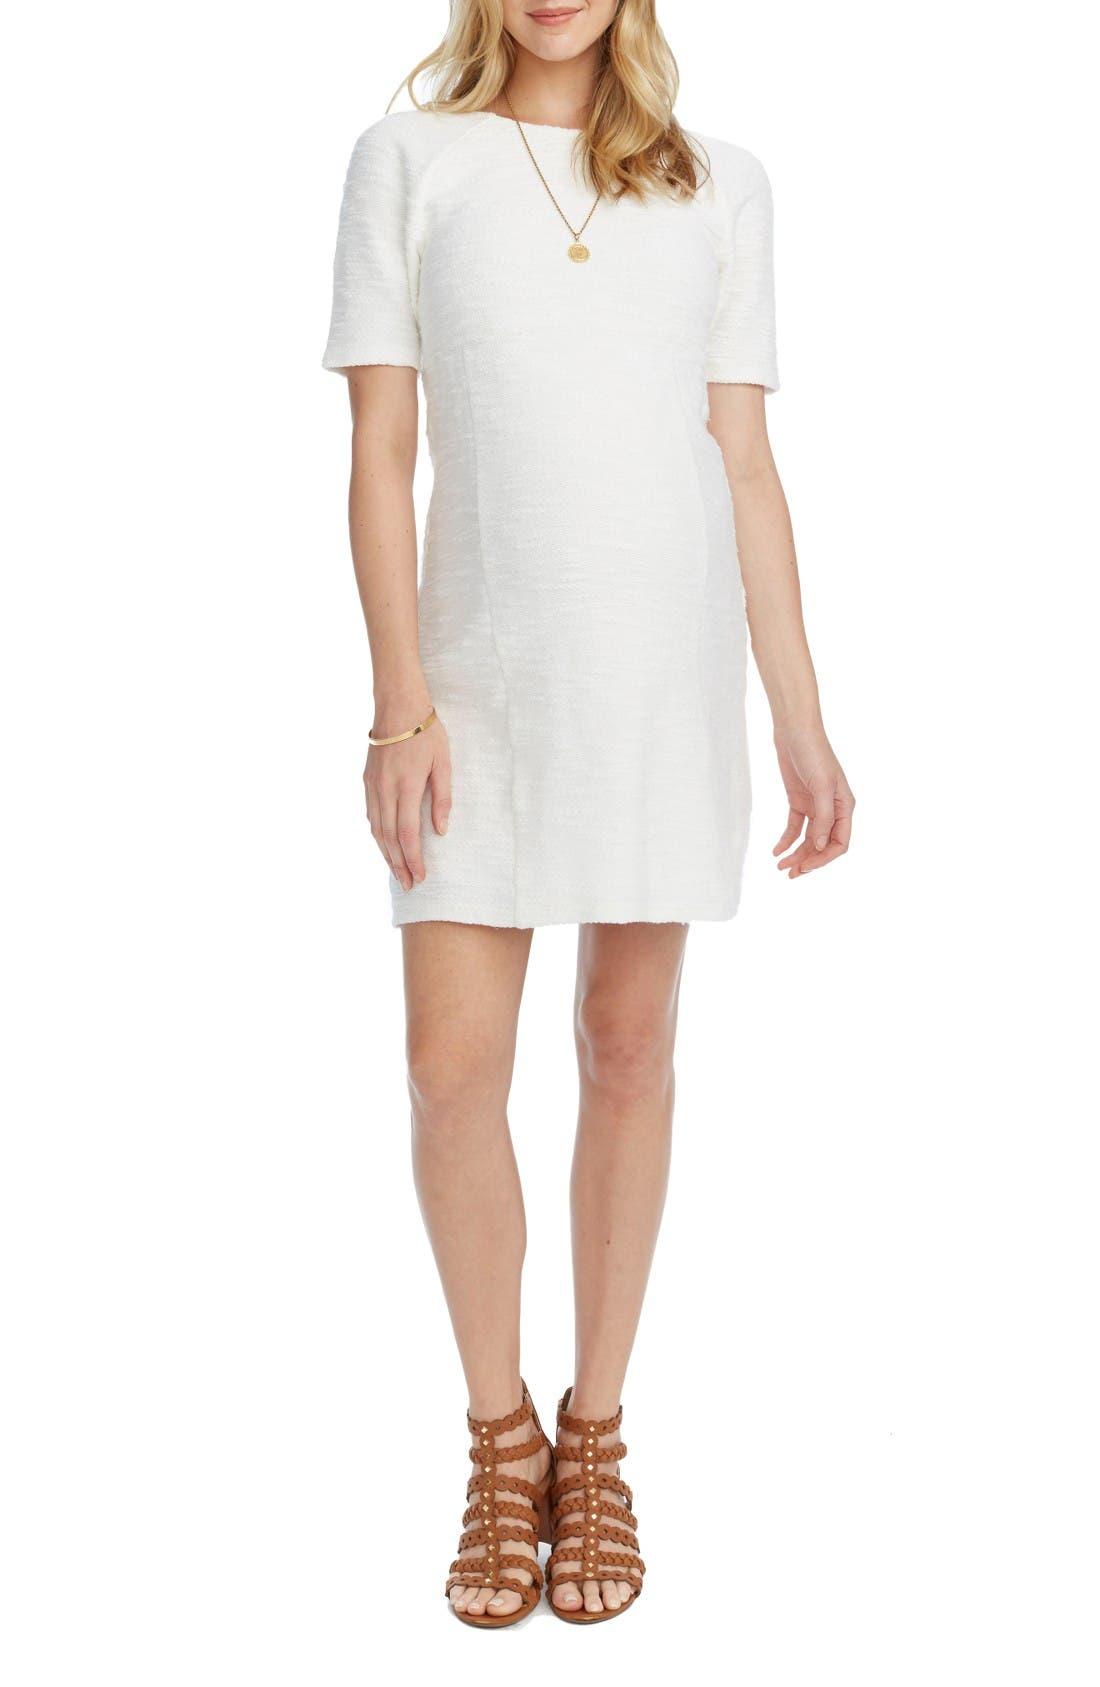 Alana Maternity Dress,                         Main,                         color, Cream